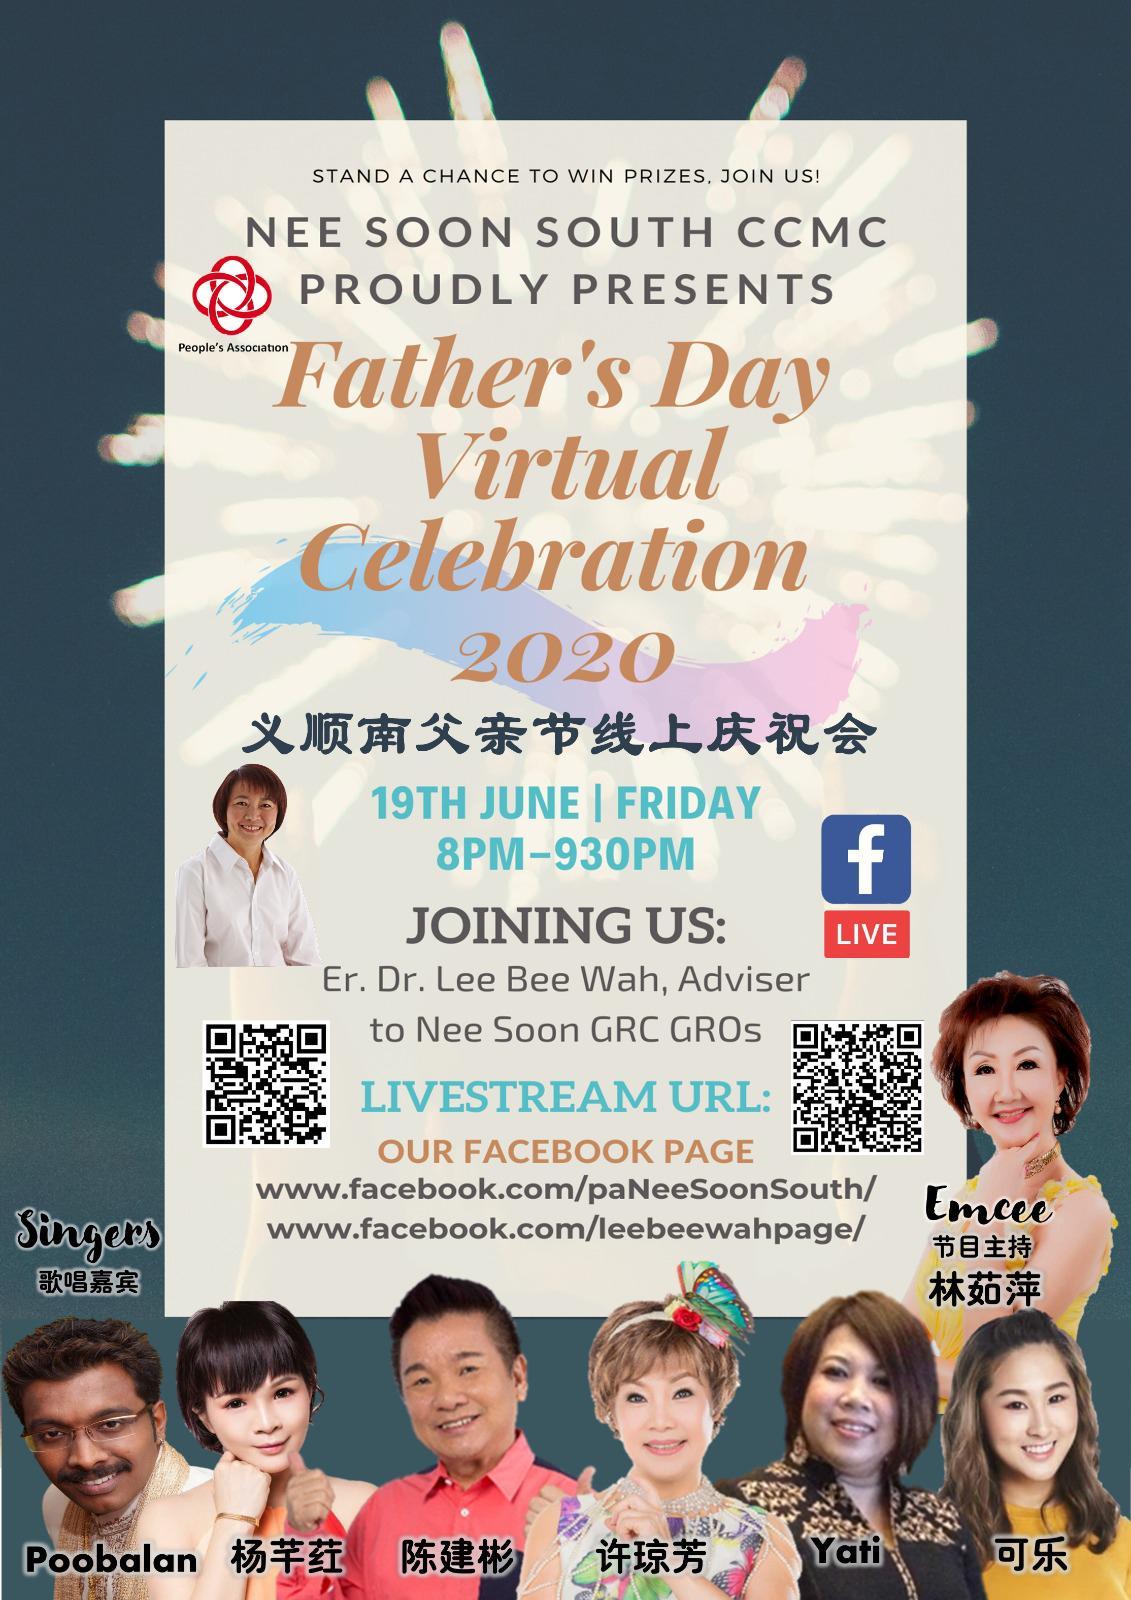 Father's Day Virtual Celebration 2020